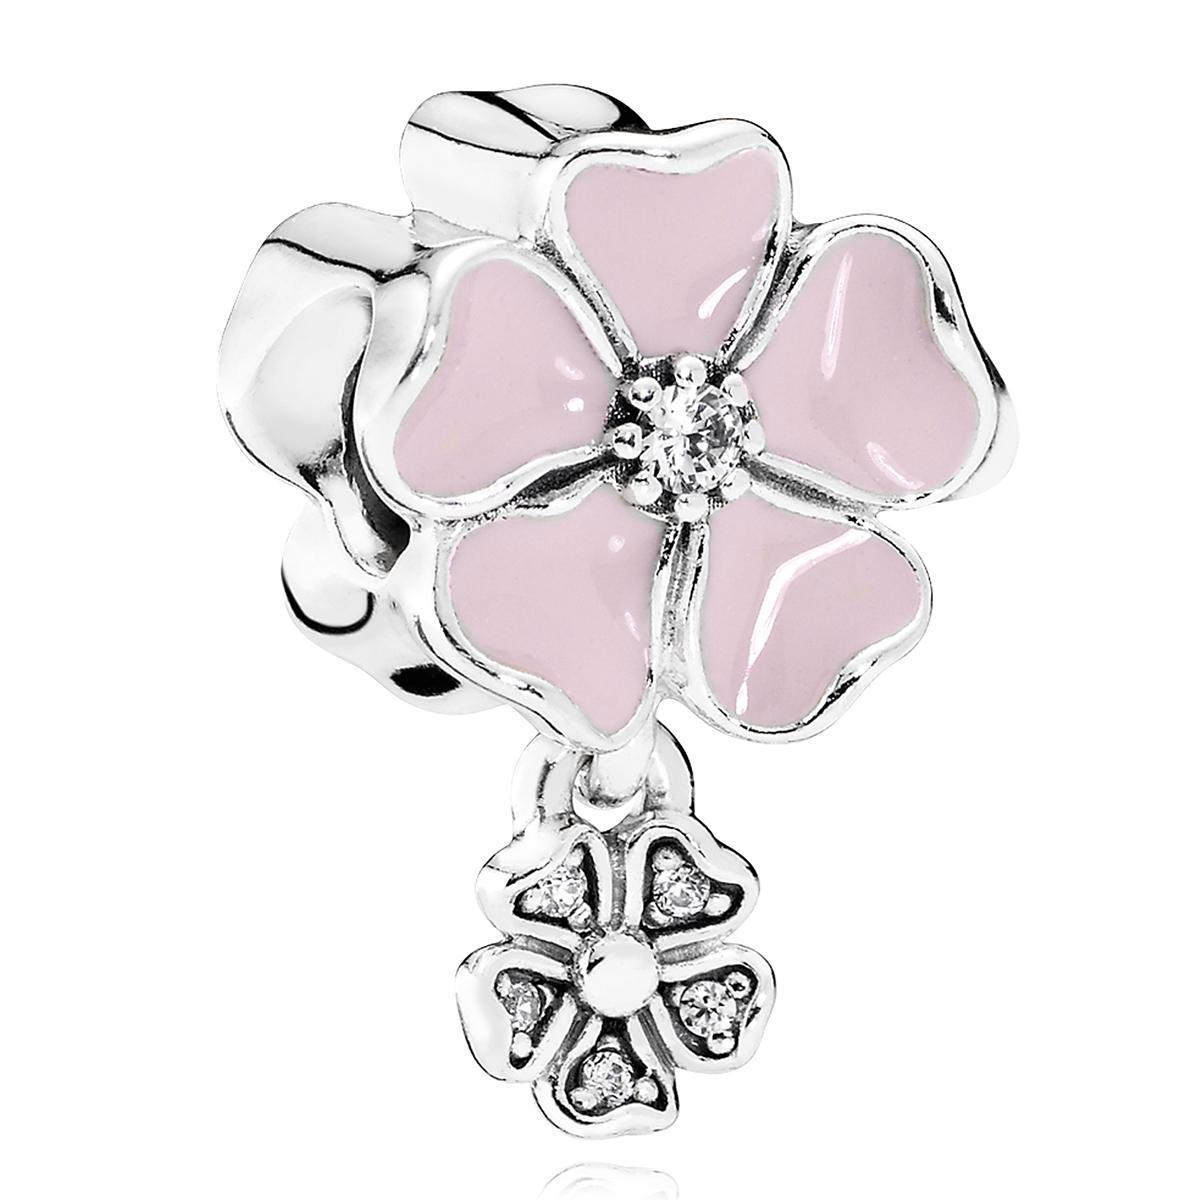 5de0fb5c4 Search Results for pandora earrings - Elisa Ilana